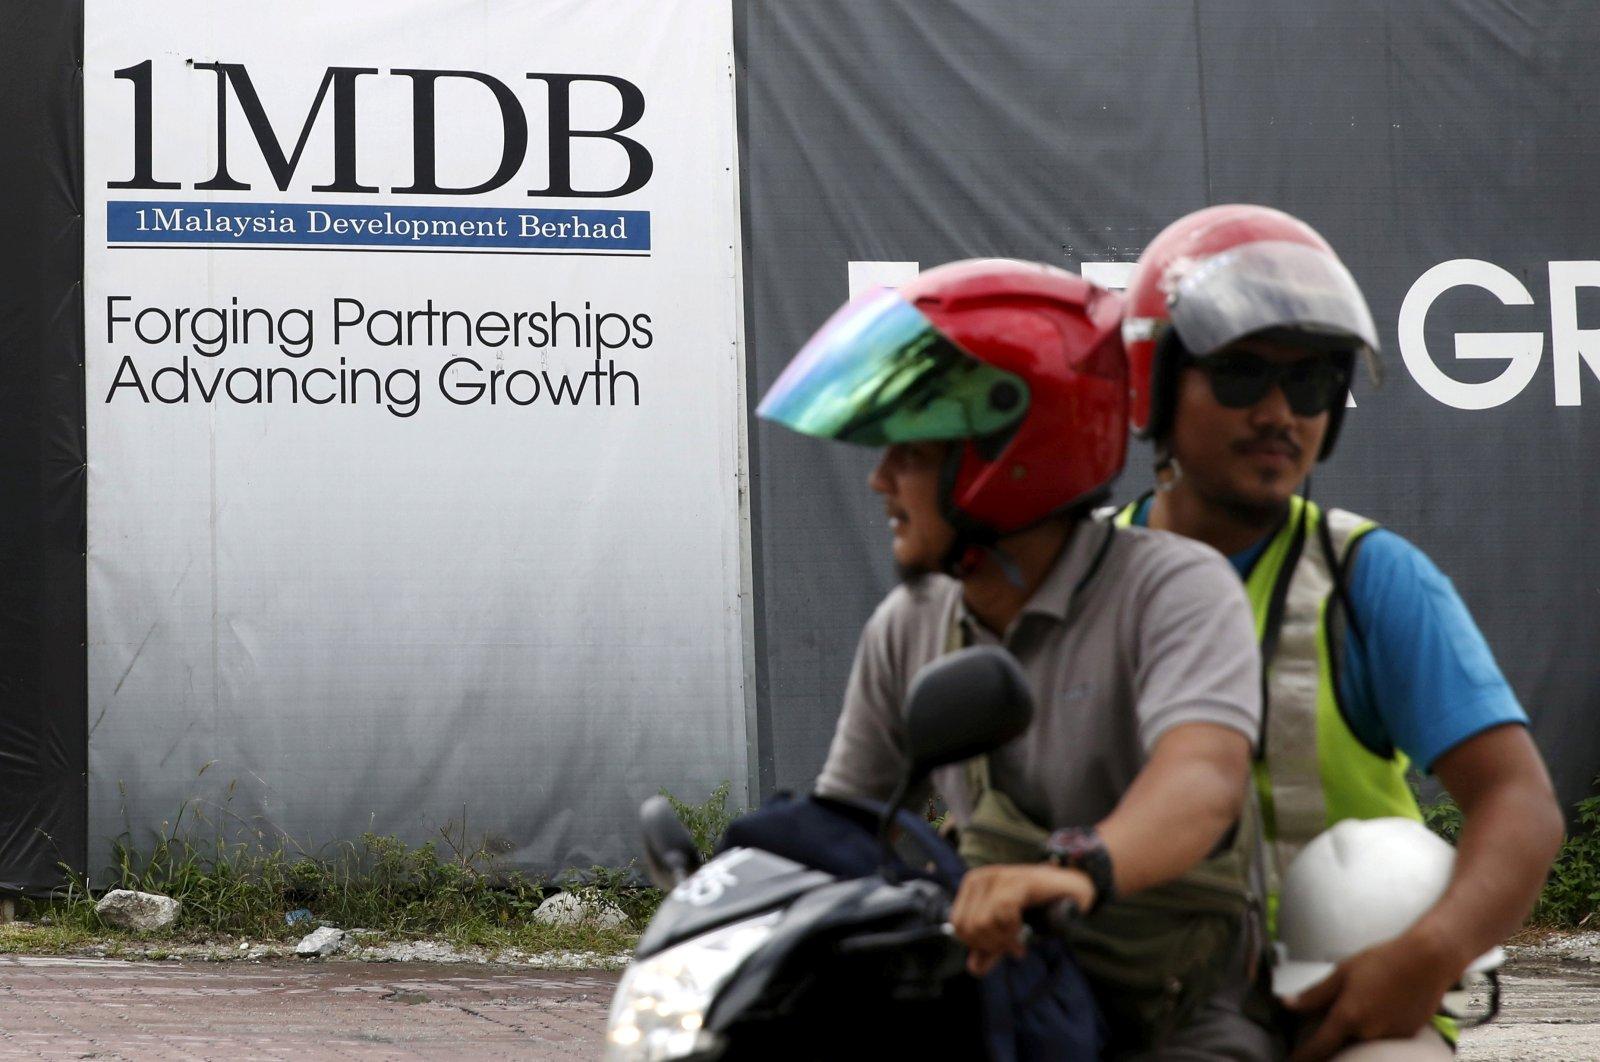 Motorcyclists pass a 1Malaysia Development Berhad (1MDB) billboard at the Tun Razak Exchange development in Kuala Lumpur, Malaysia, Feb. 3, 2016. (Reuters Photo)